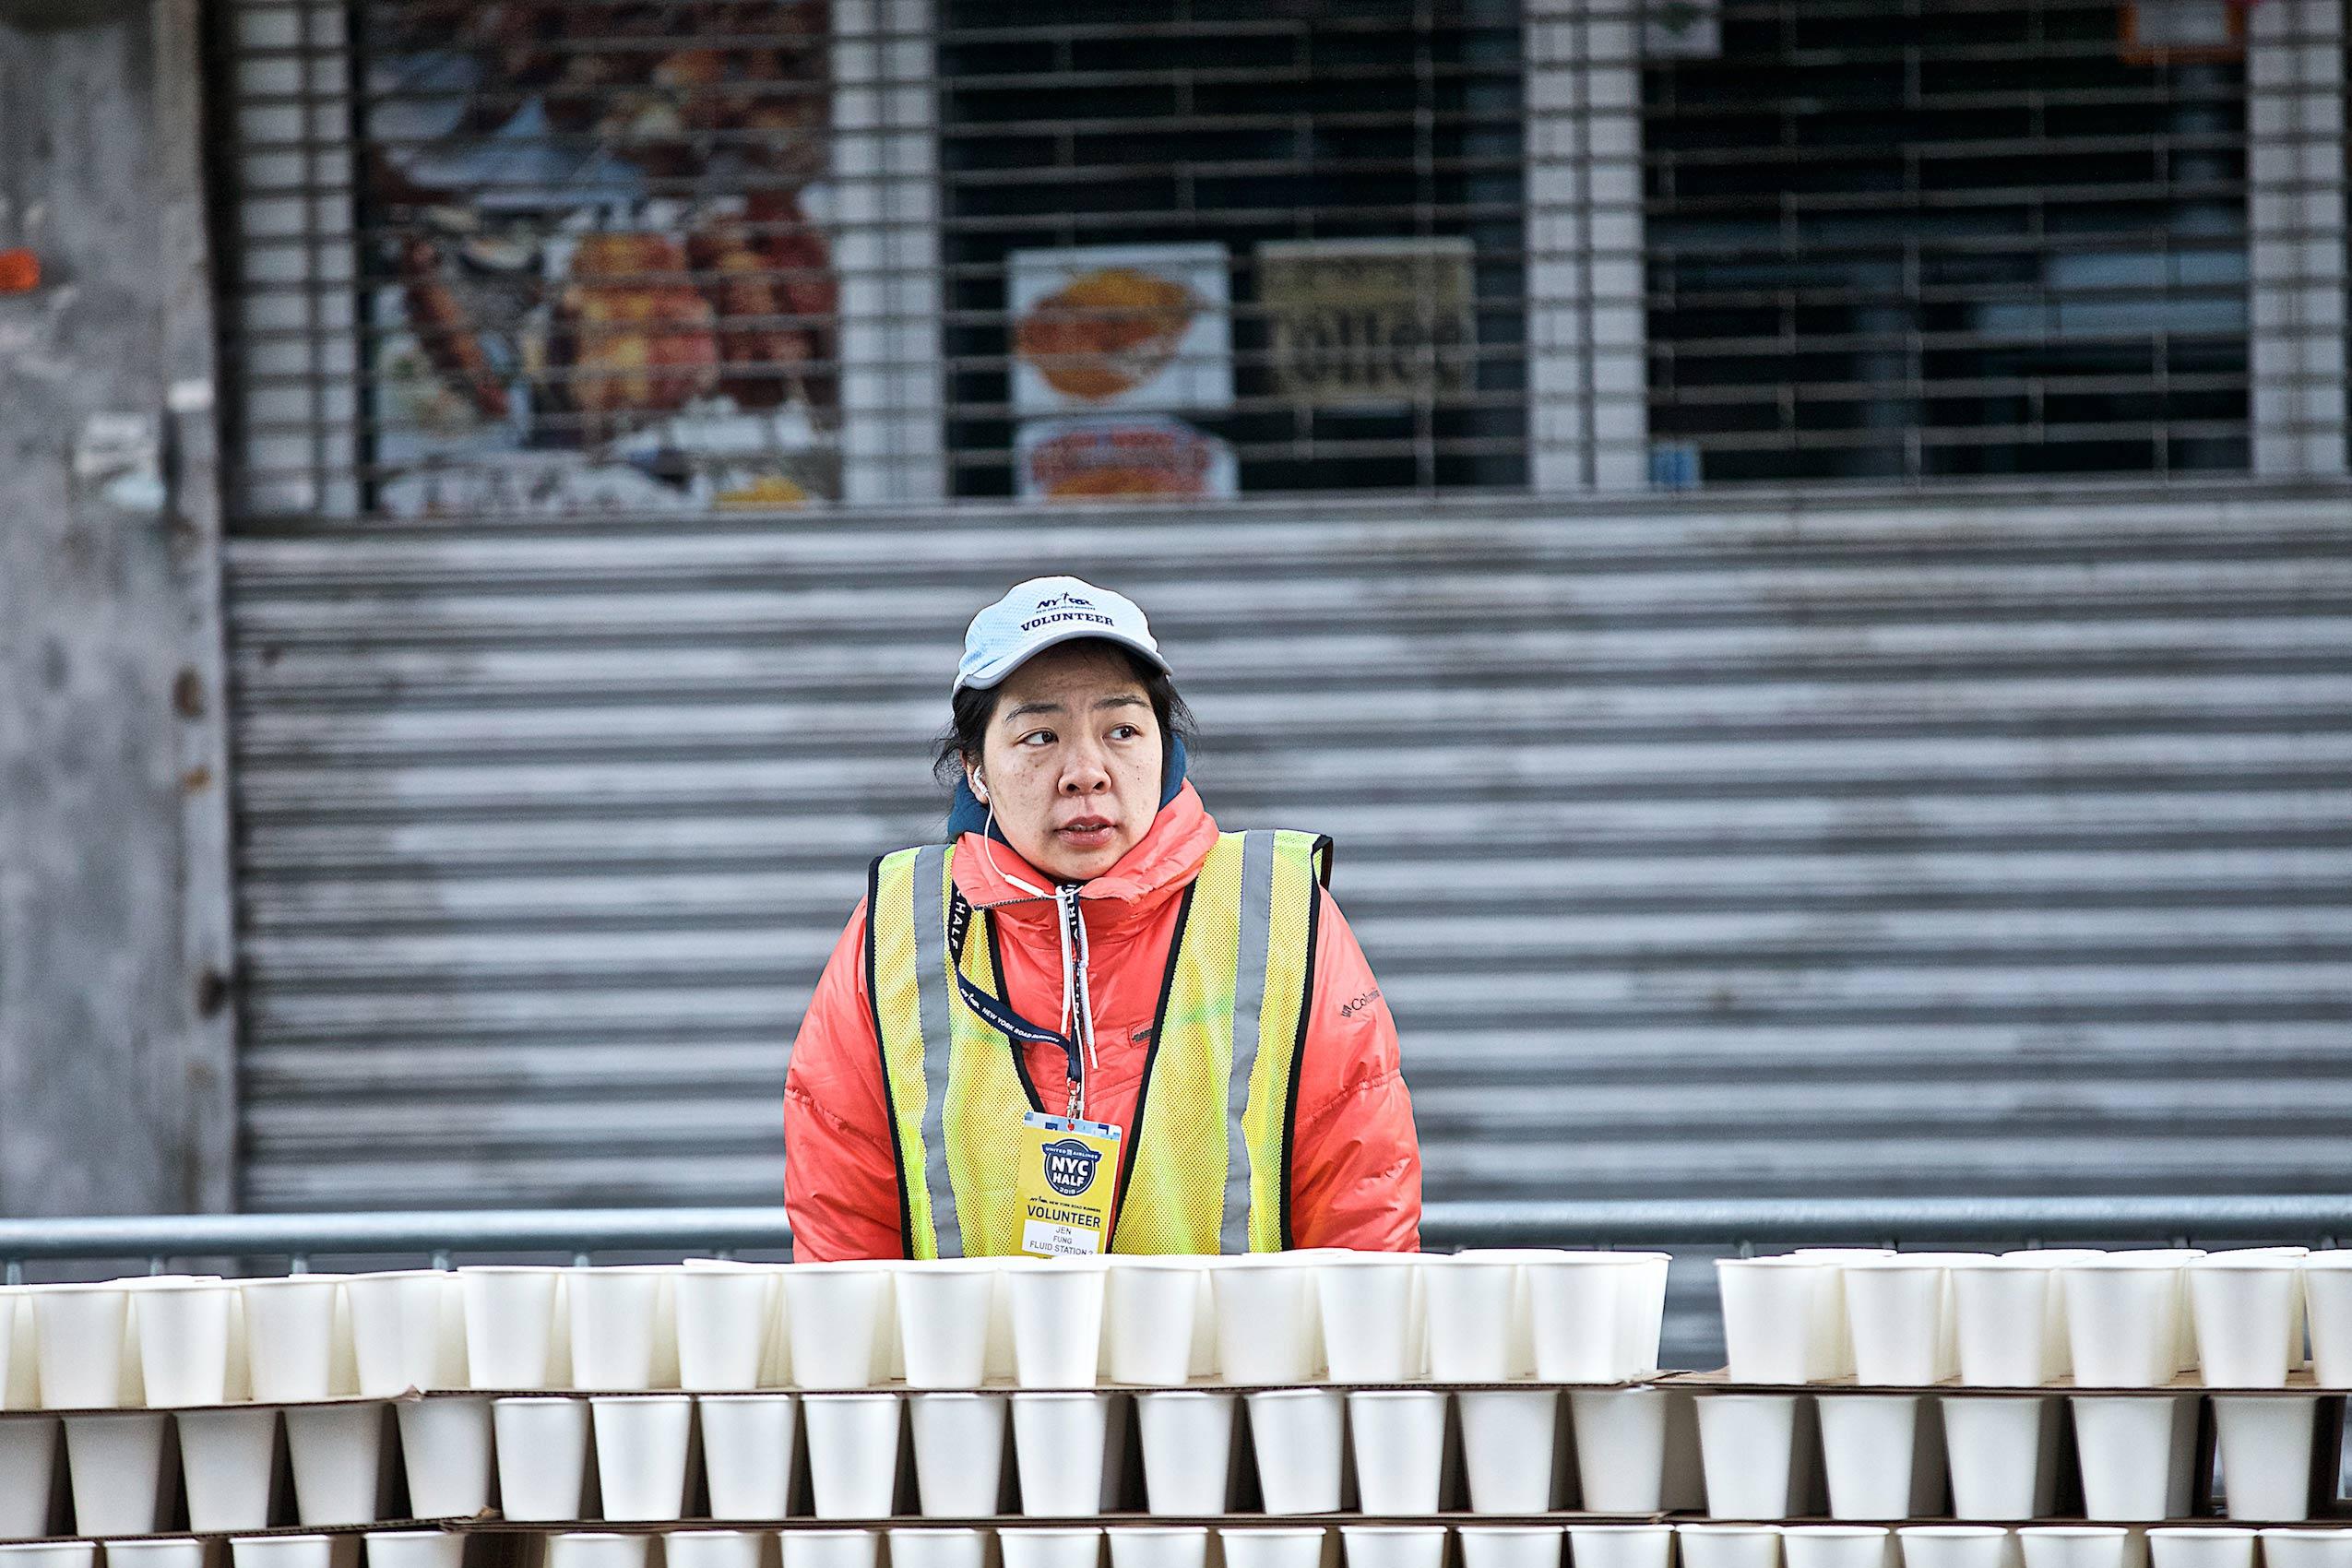 A volunteer at the  NYC Half Marathon